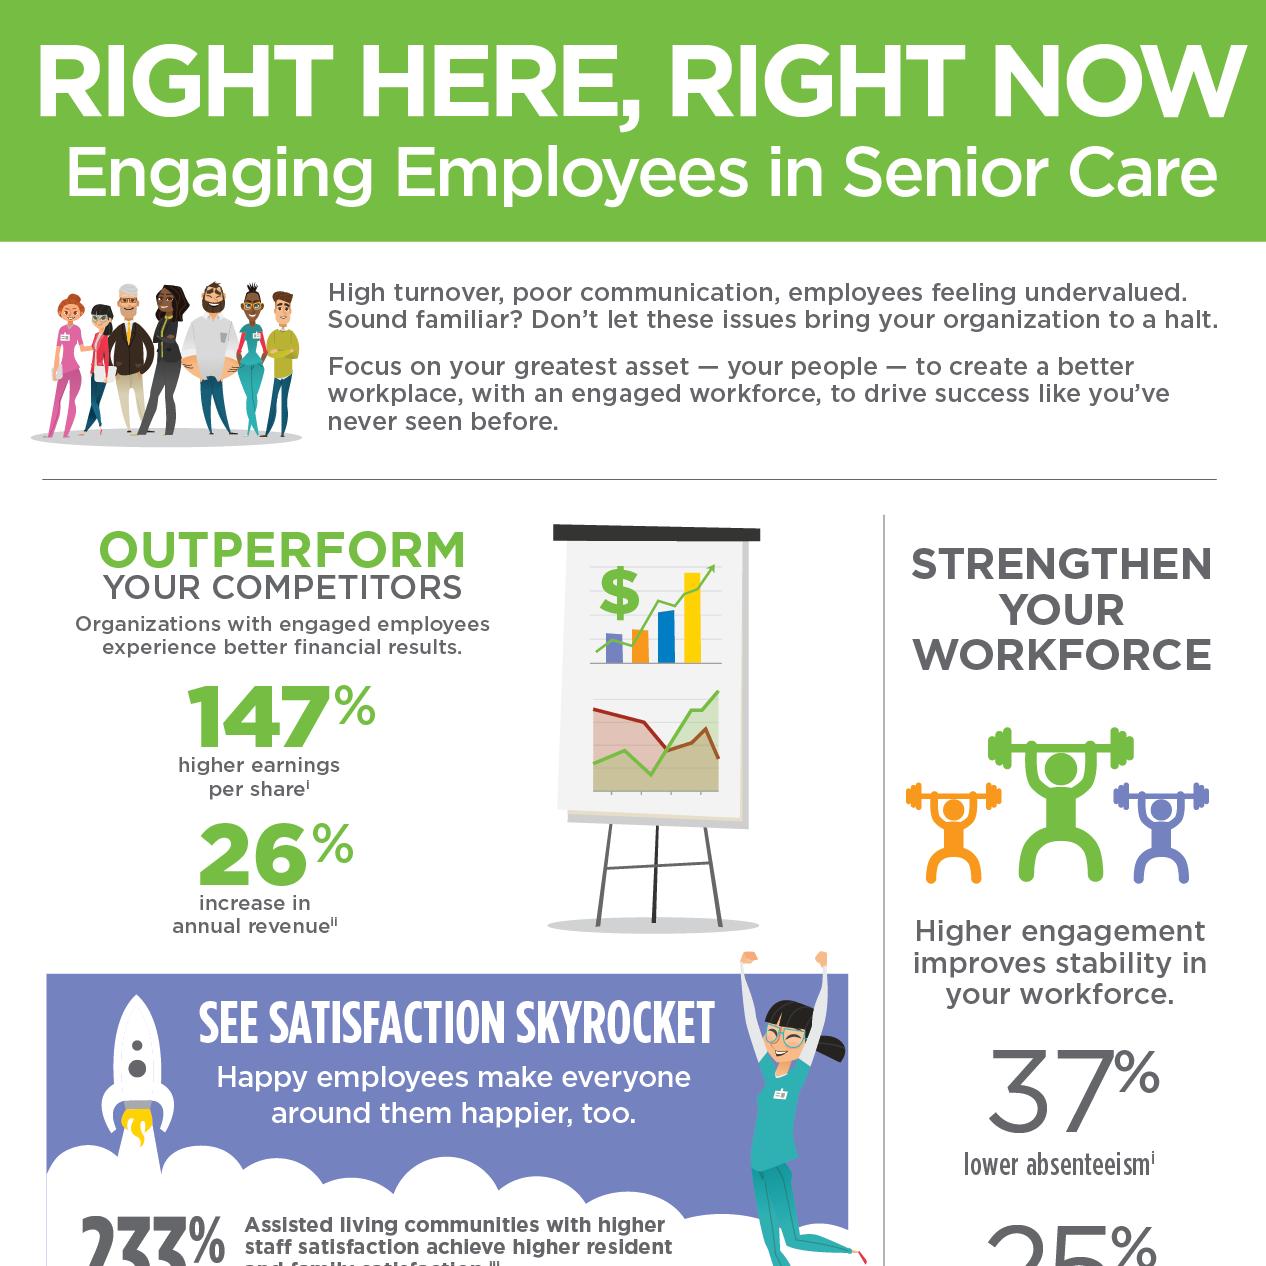 employee engagement in senior care